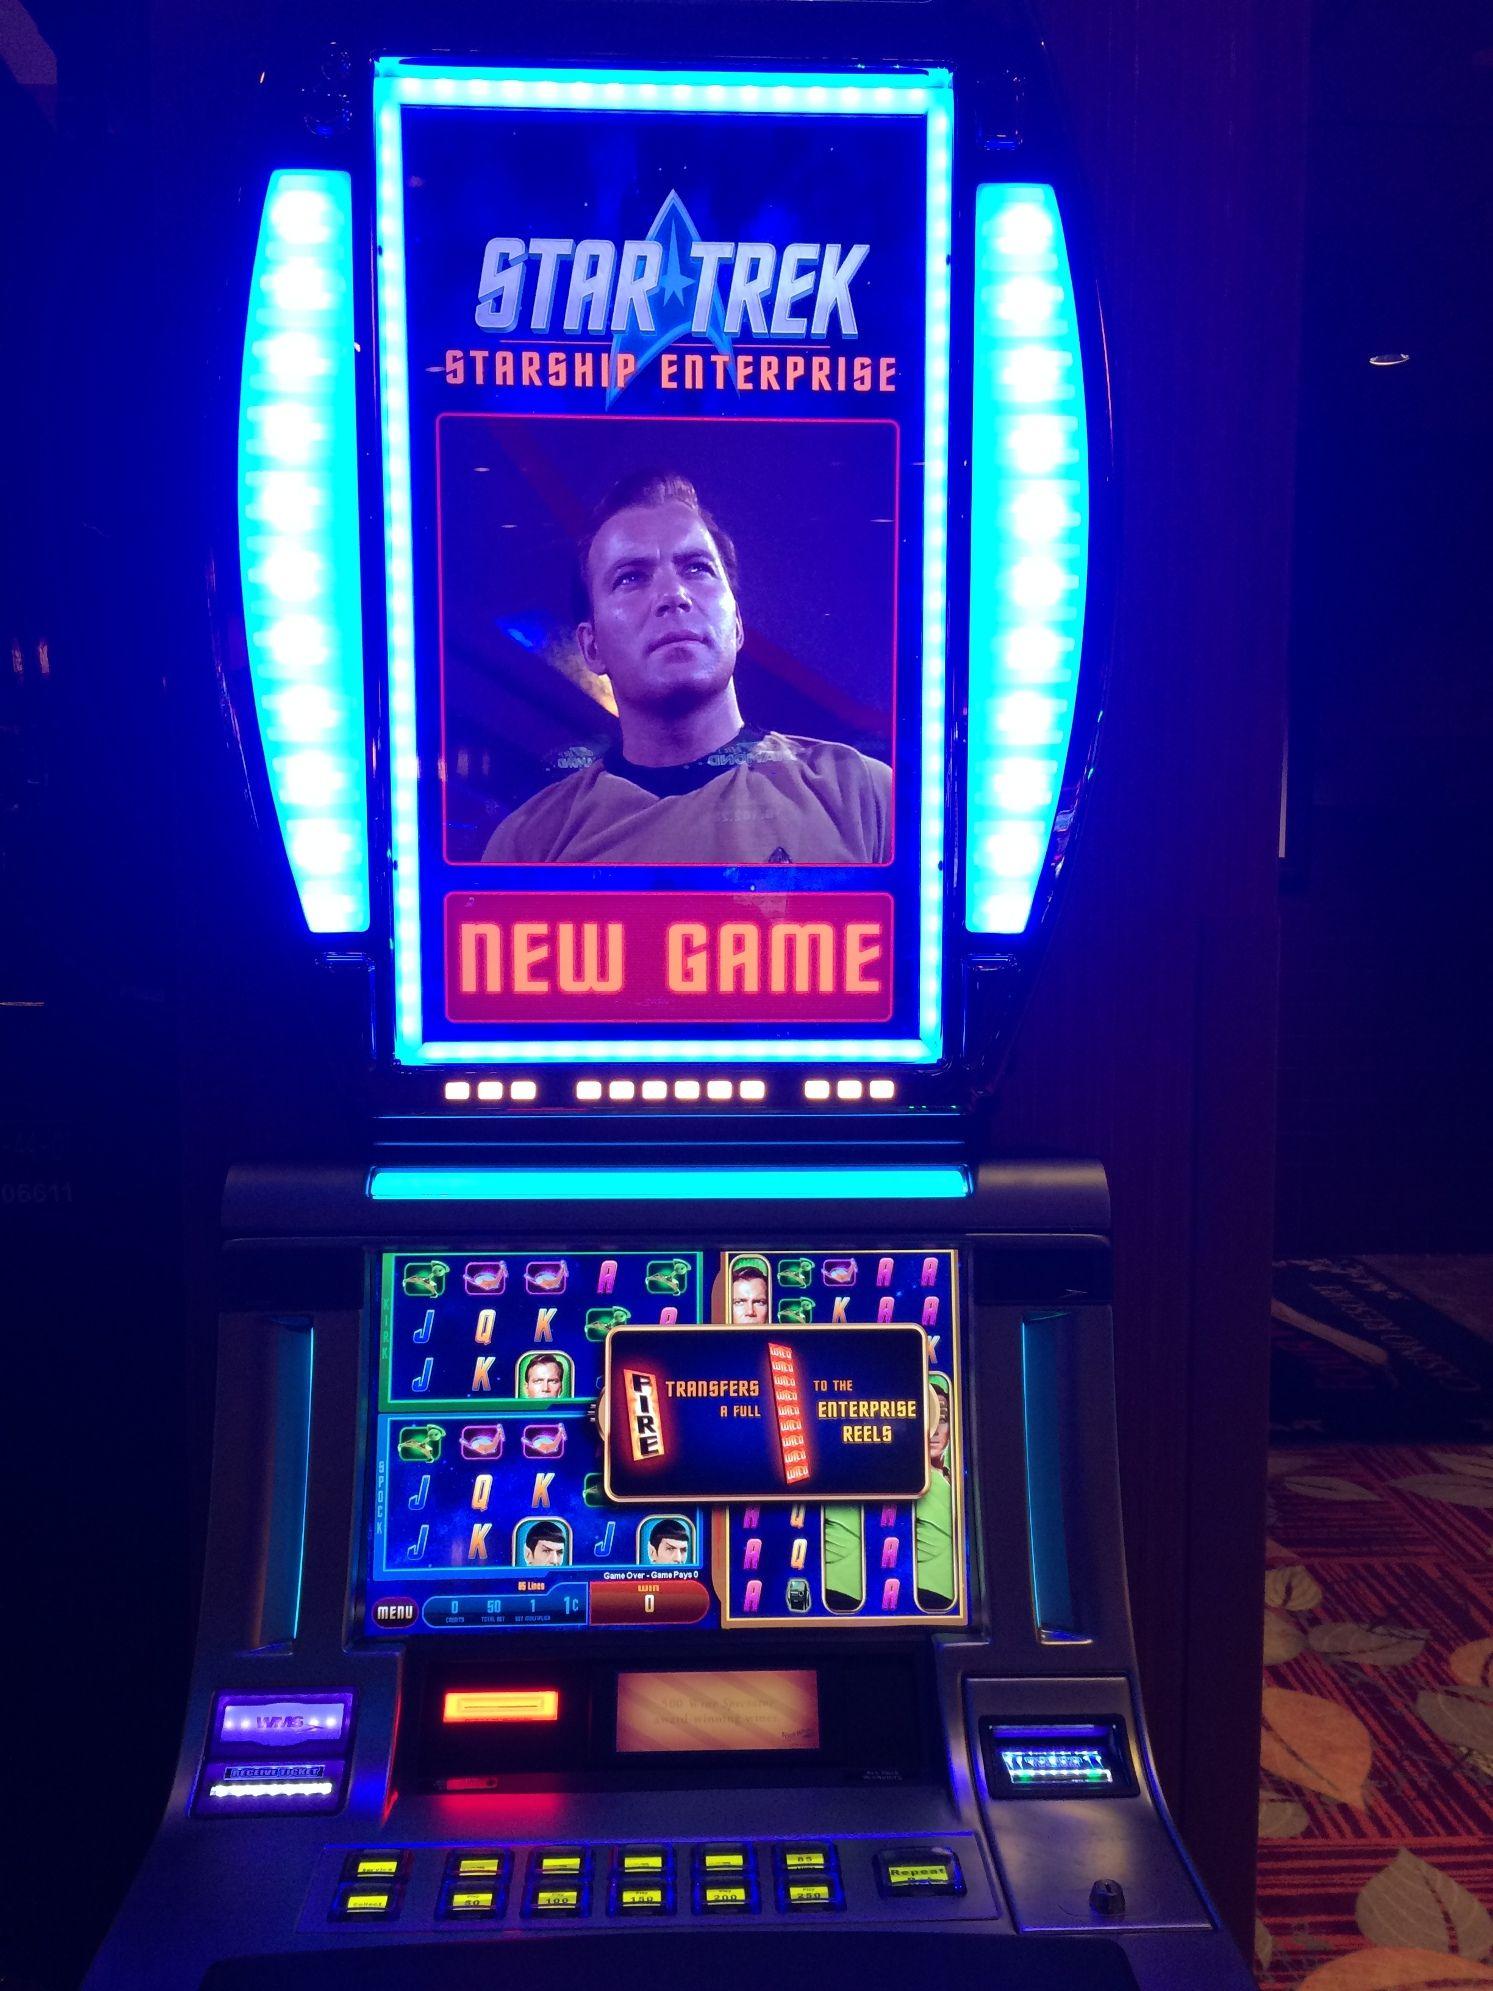 Trial roulette ffxiv 2.4